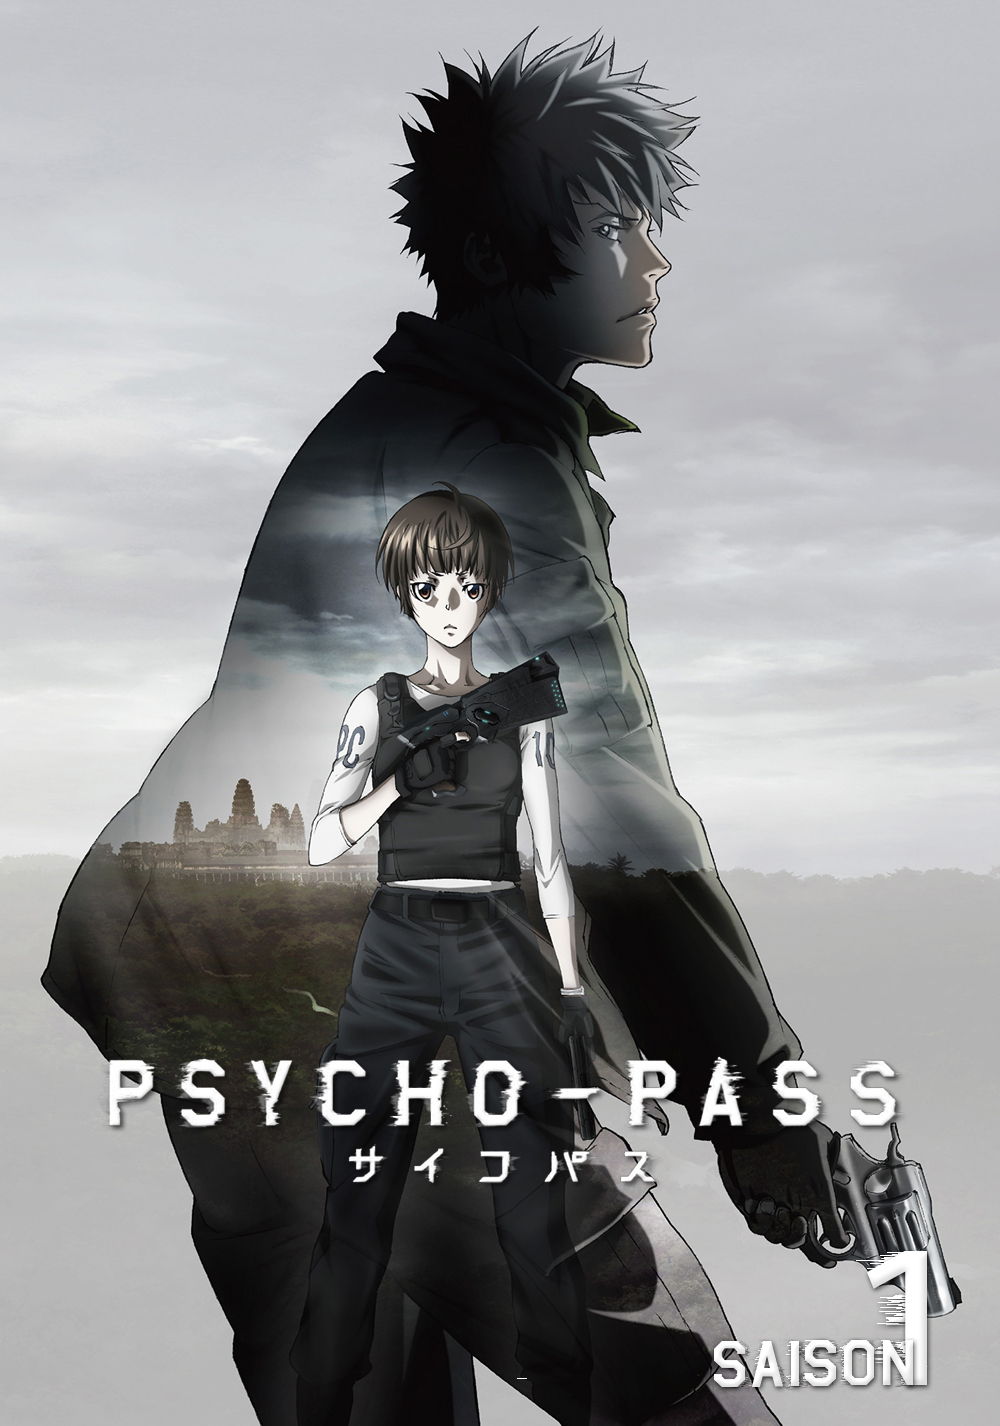 Psycho Tv